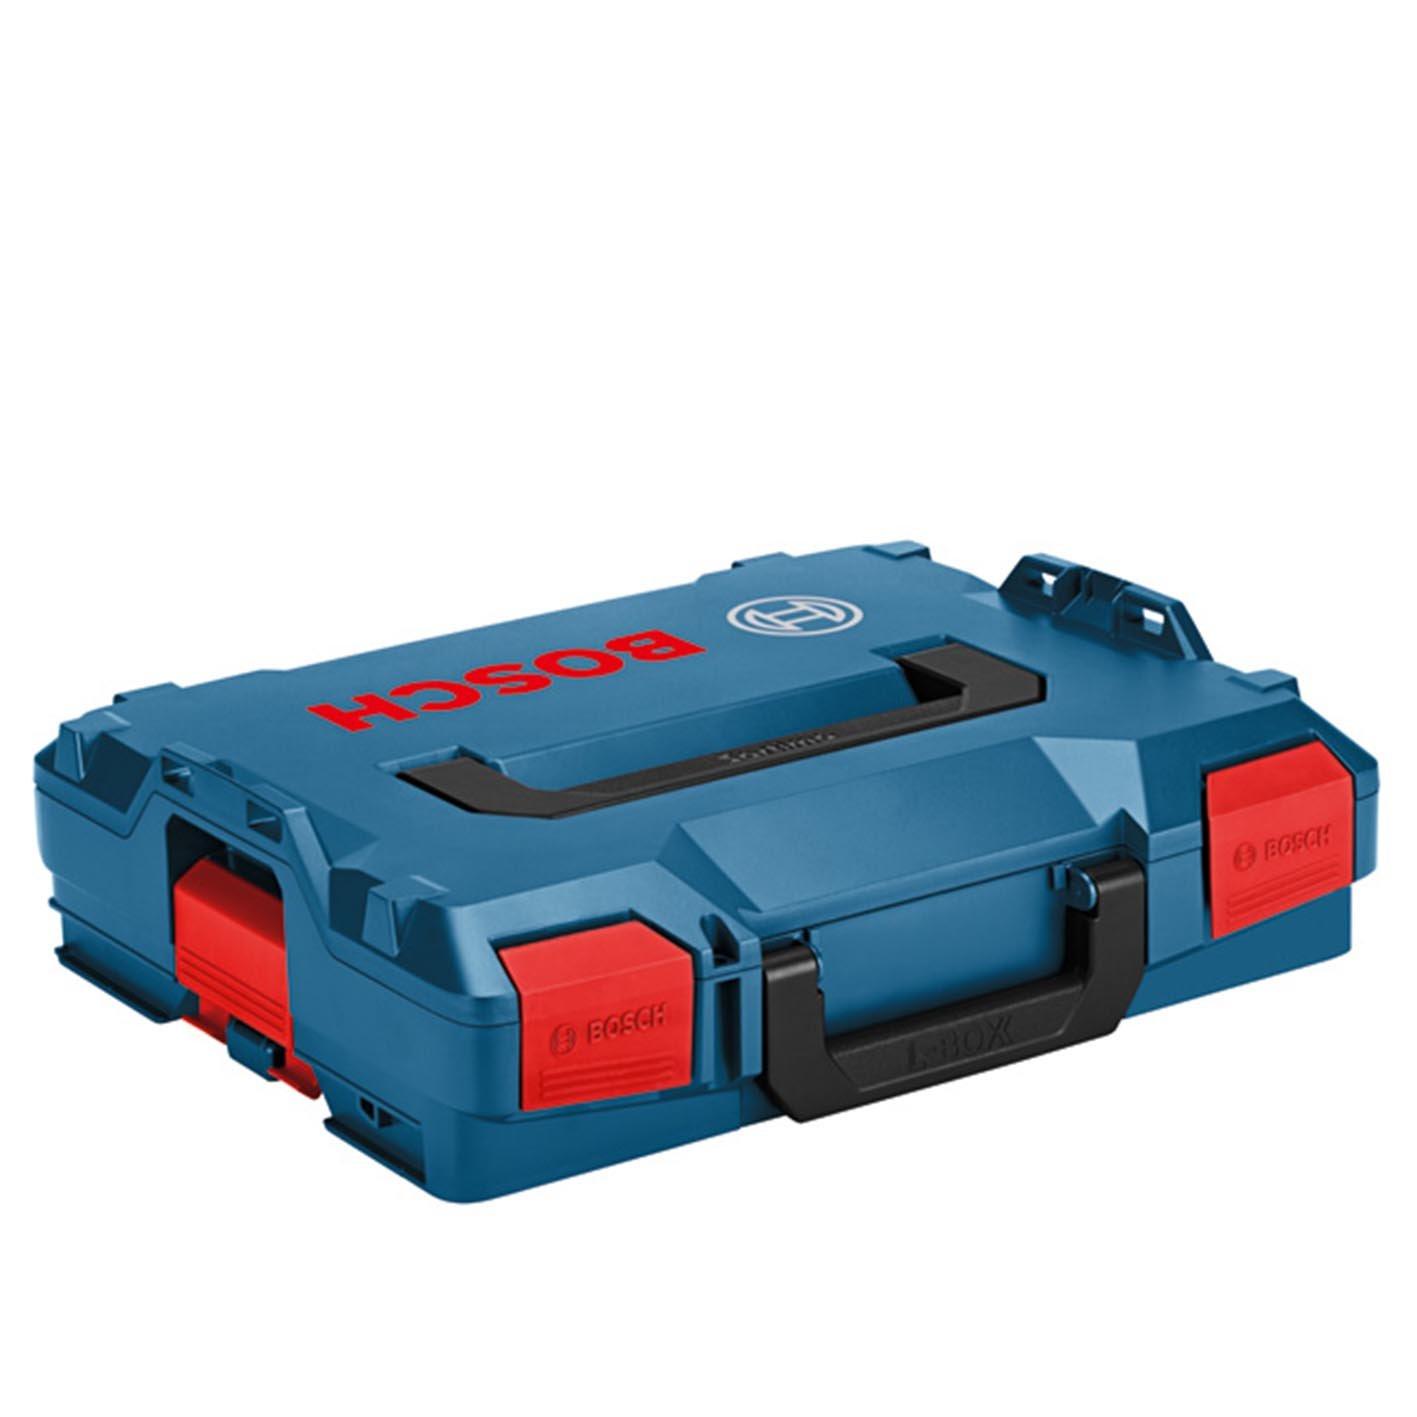 Blu Bosch Professional 1600A012G2 Valigetta